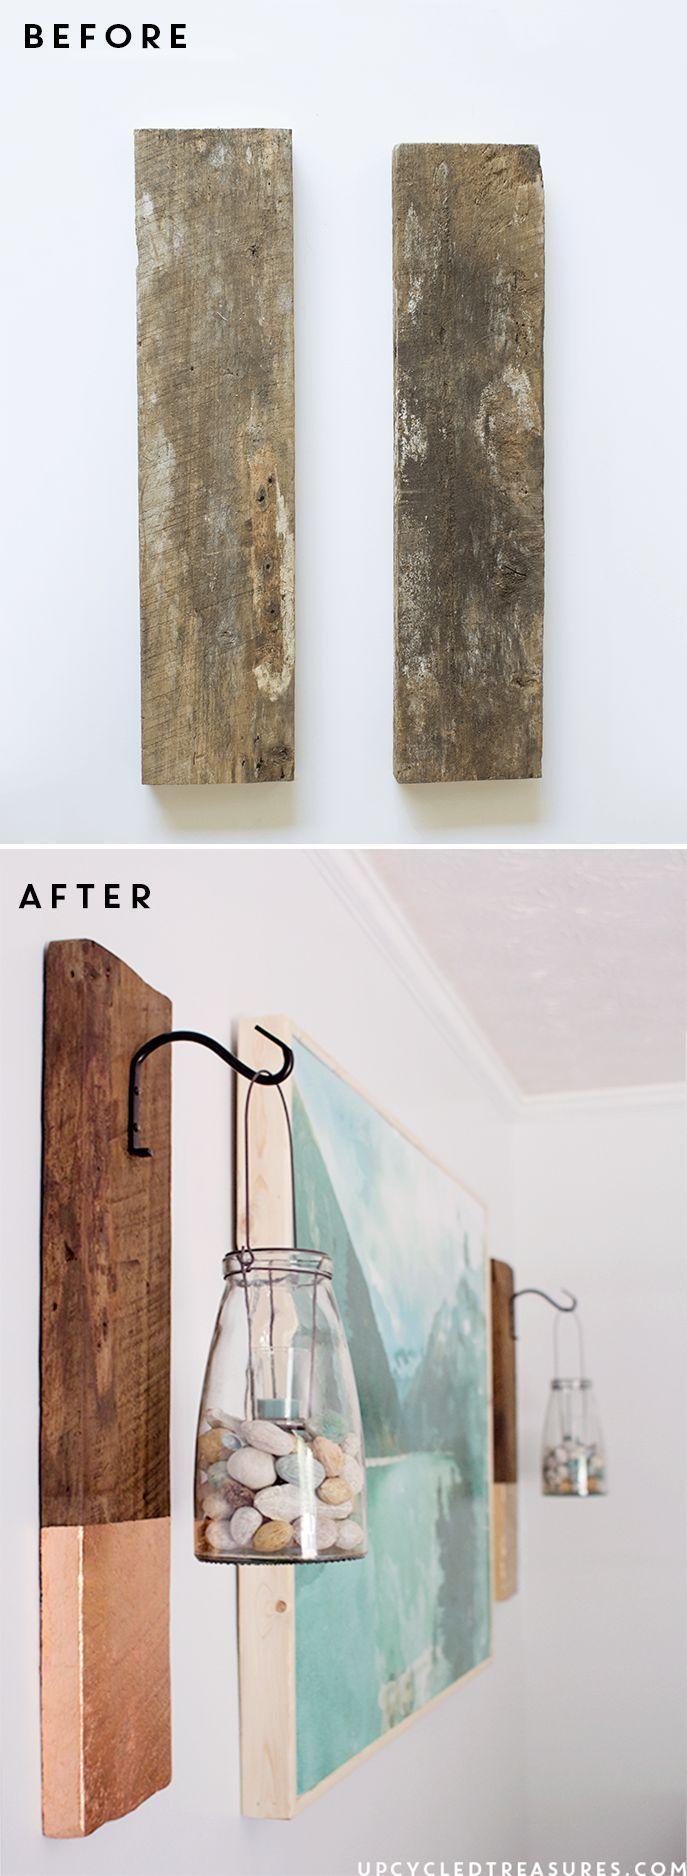 Best 10+ Diy Wall Art Ideas On Pinterest | Diy Art, Diy Wall Decor Intended For Long Vertical Wall Art (Image 3 of 20)